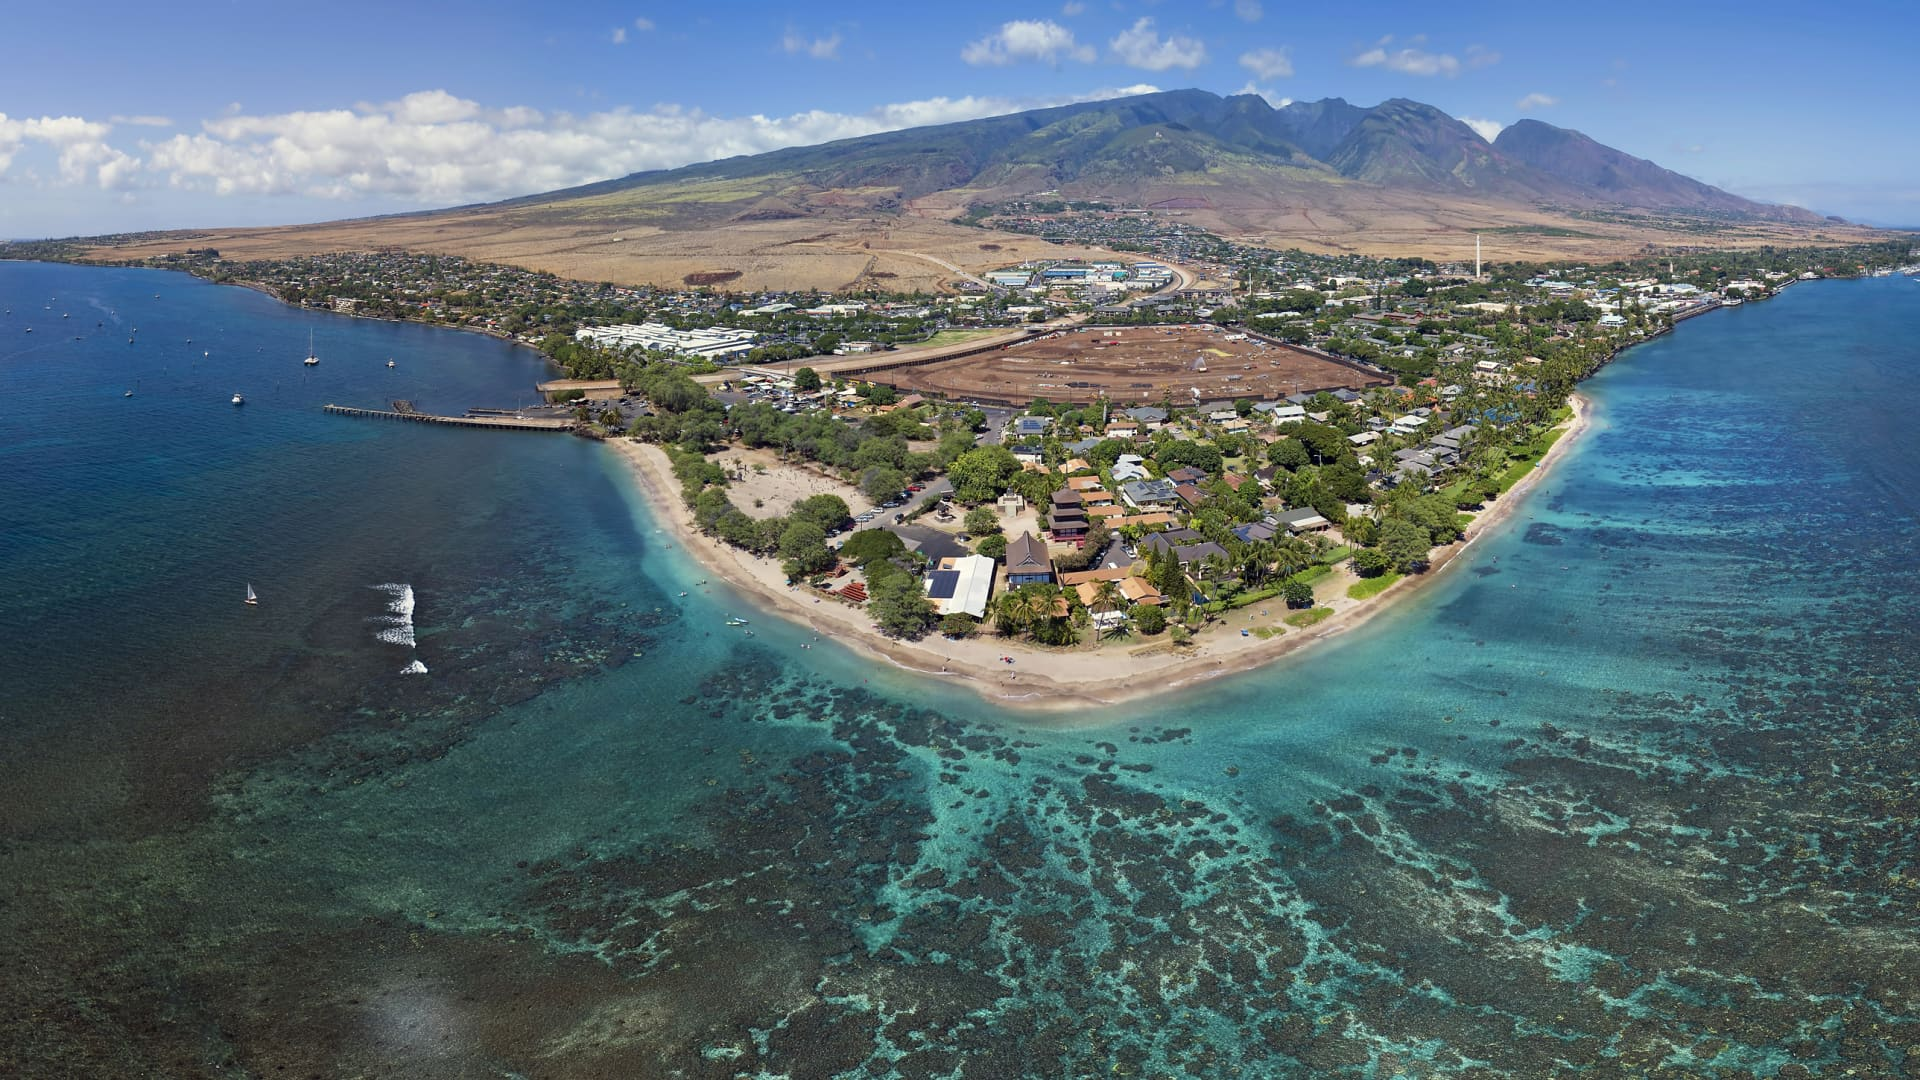 Drone aerial panorama of Baby Beach on the Island of Maui, Hawaii.